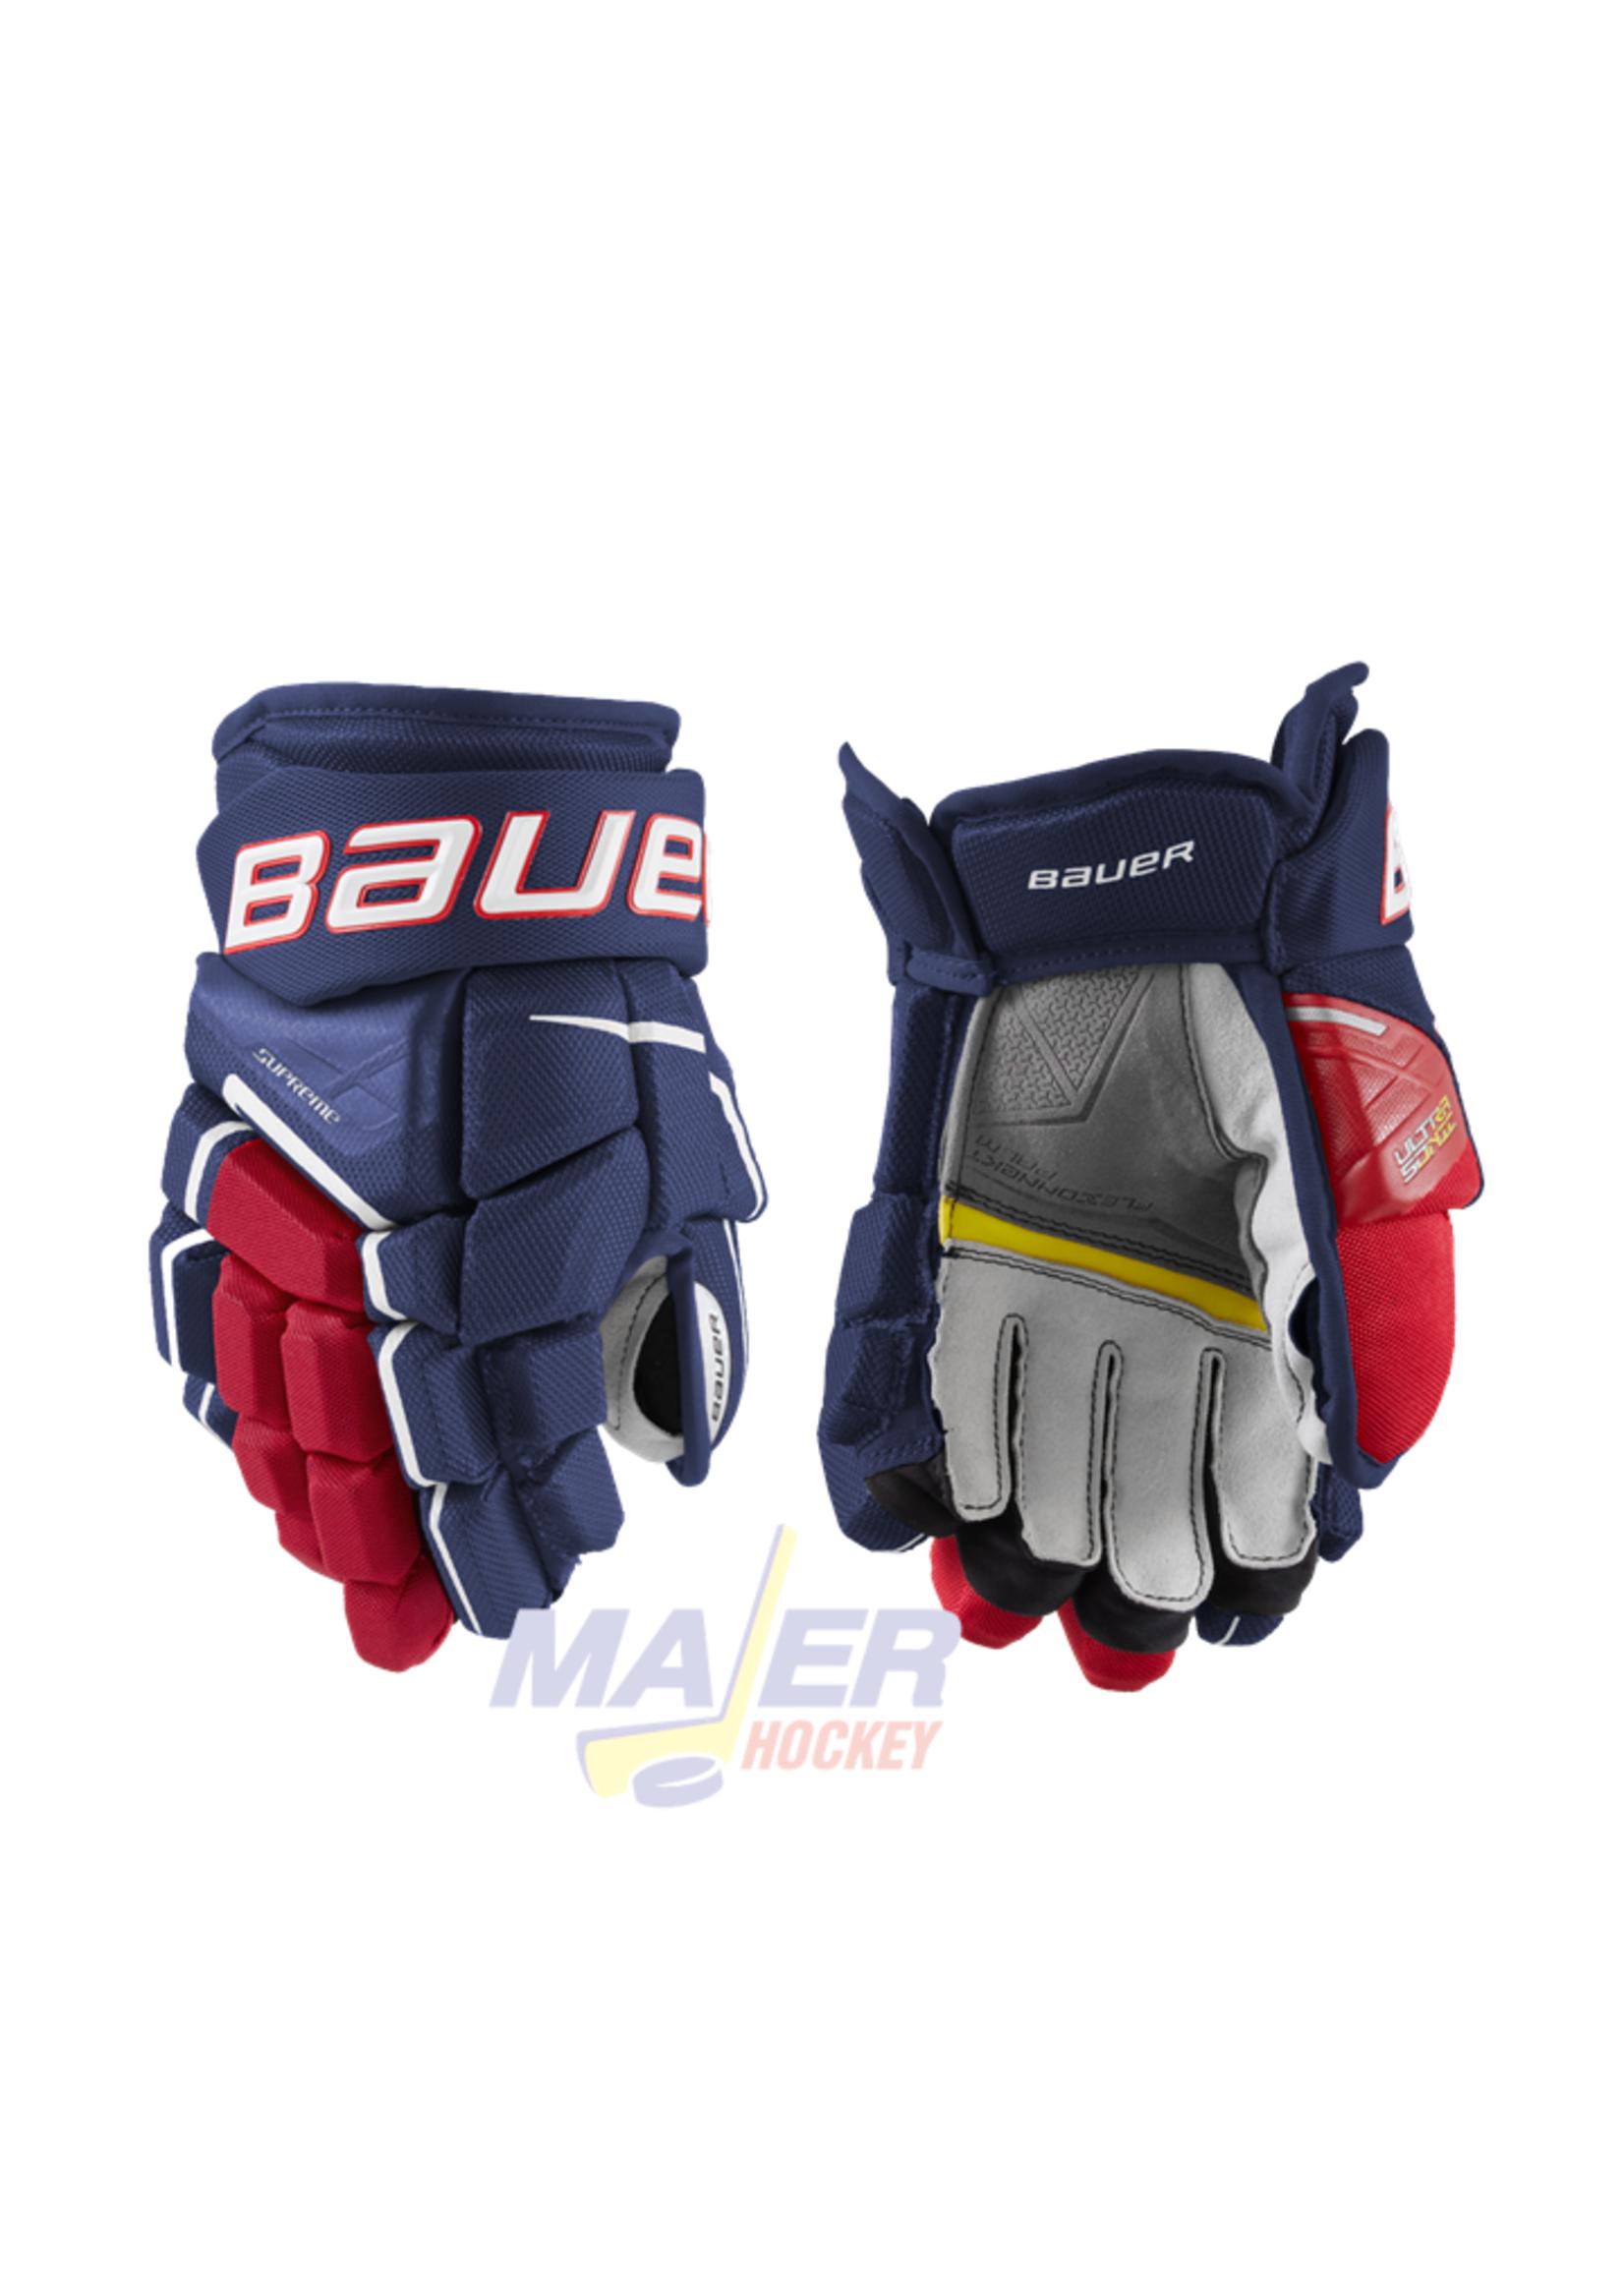 Bauer Supreme Ultrasonic Sr Gloves